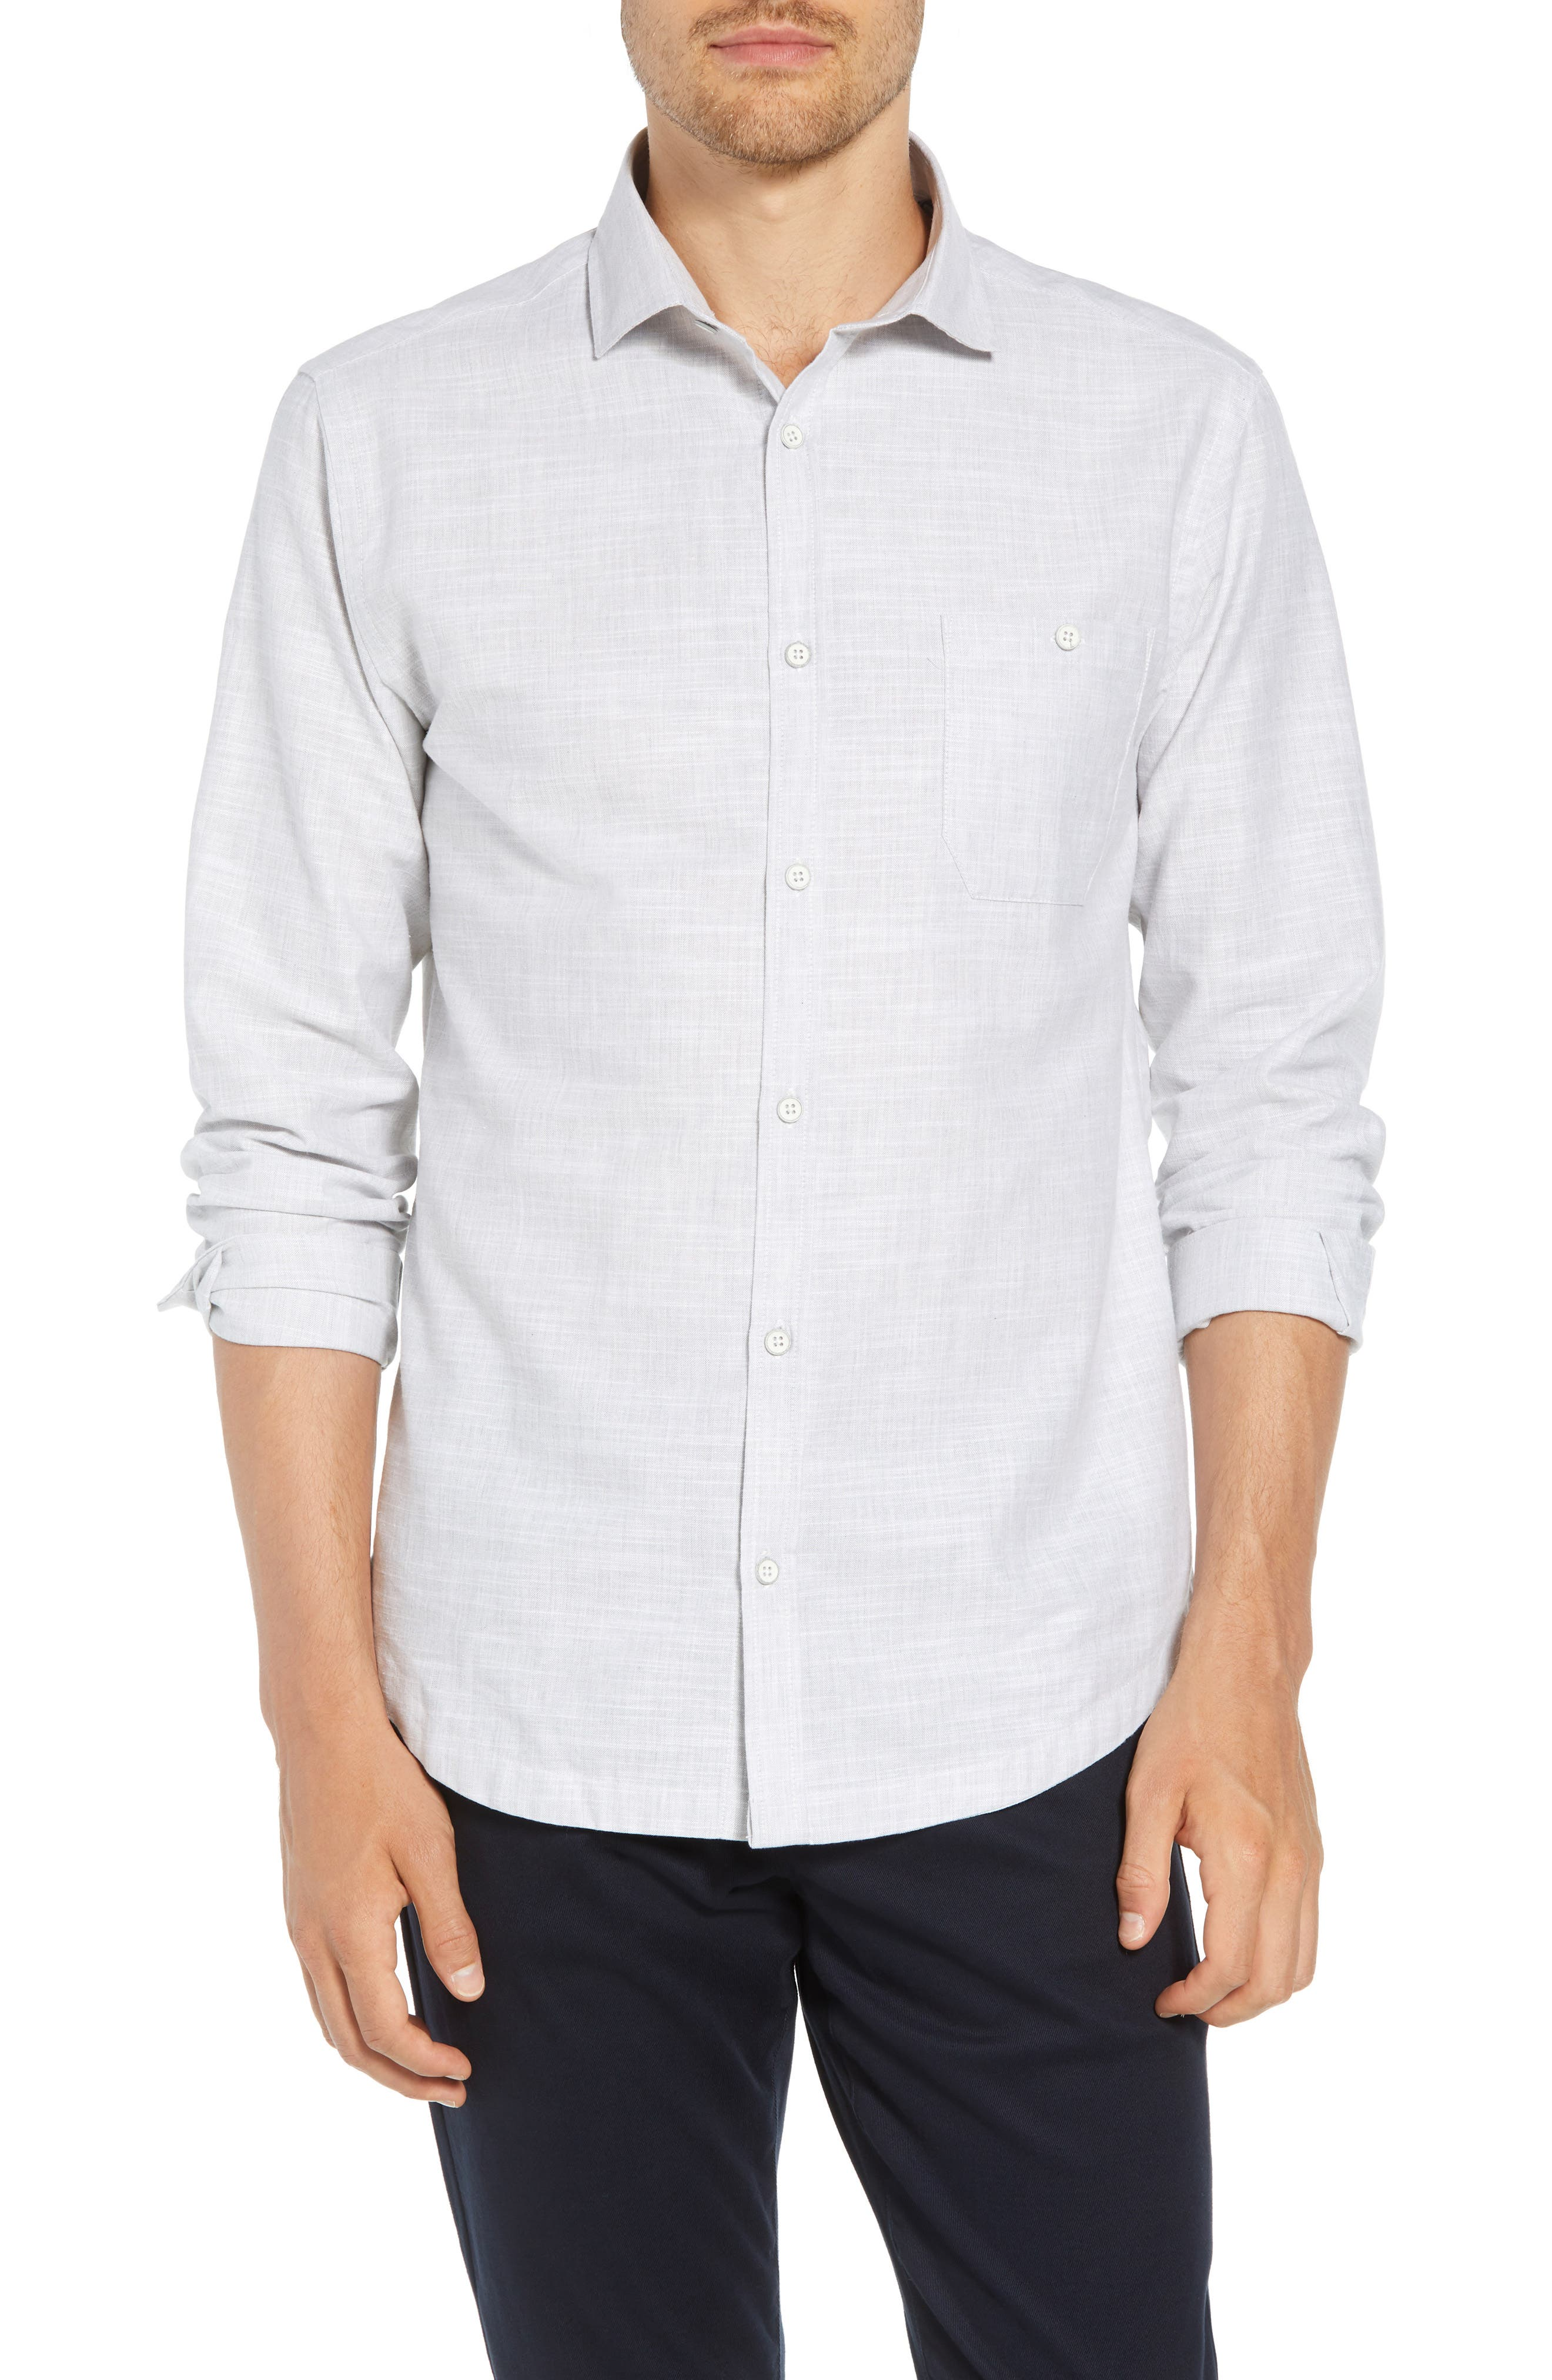 Rugger Regular Fit Sport Shirt,                             Main thumbnail 1, color,                             LIGHT GREY